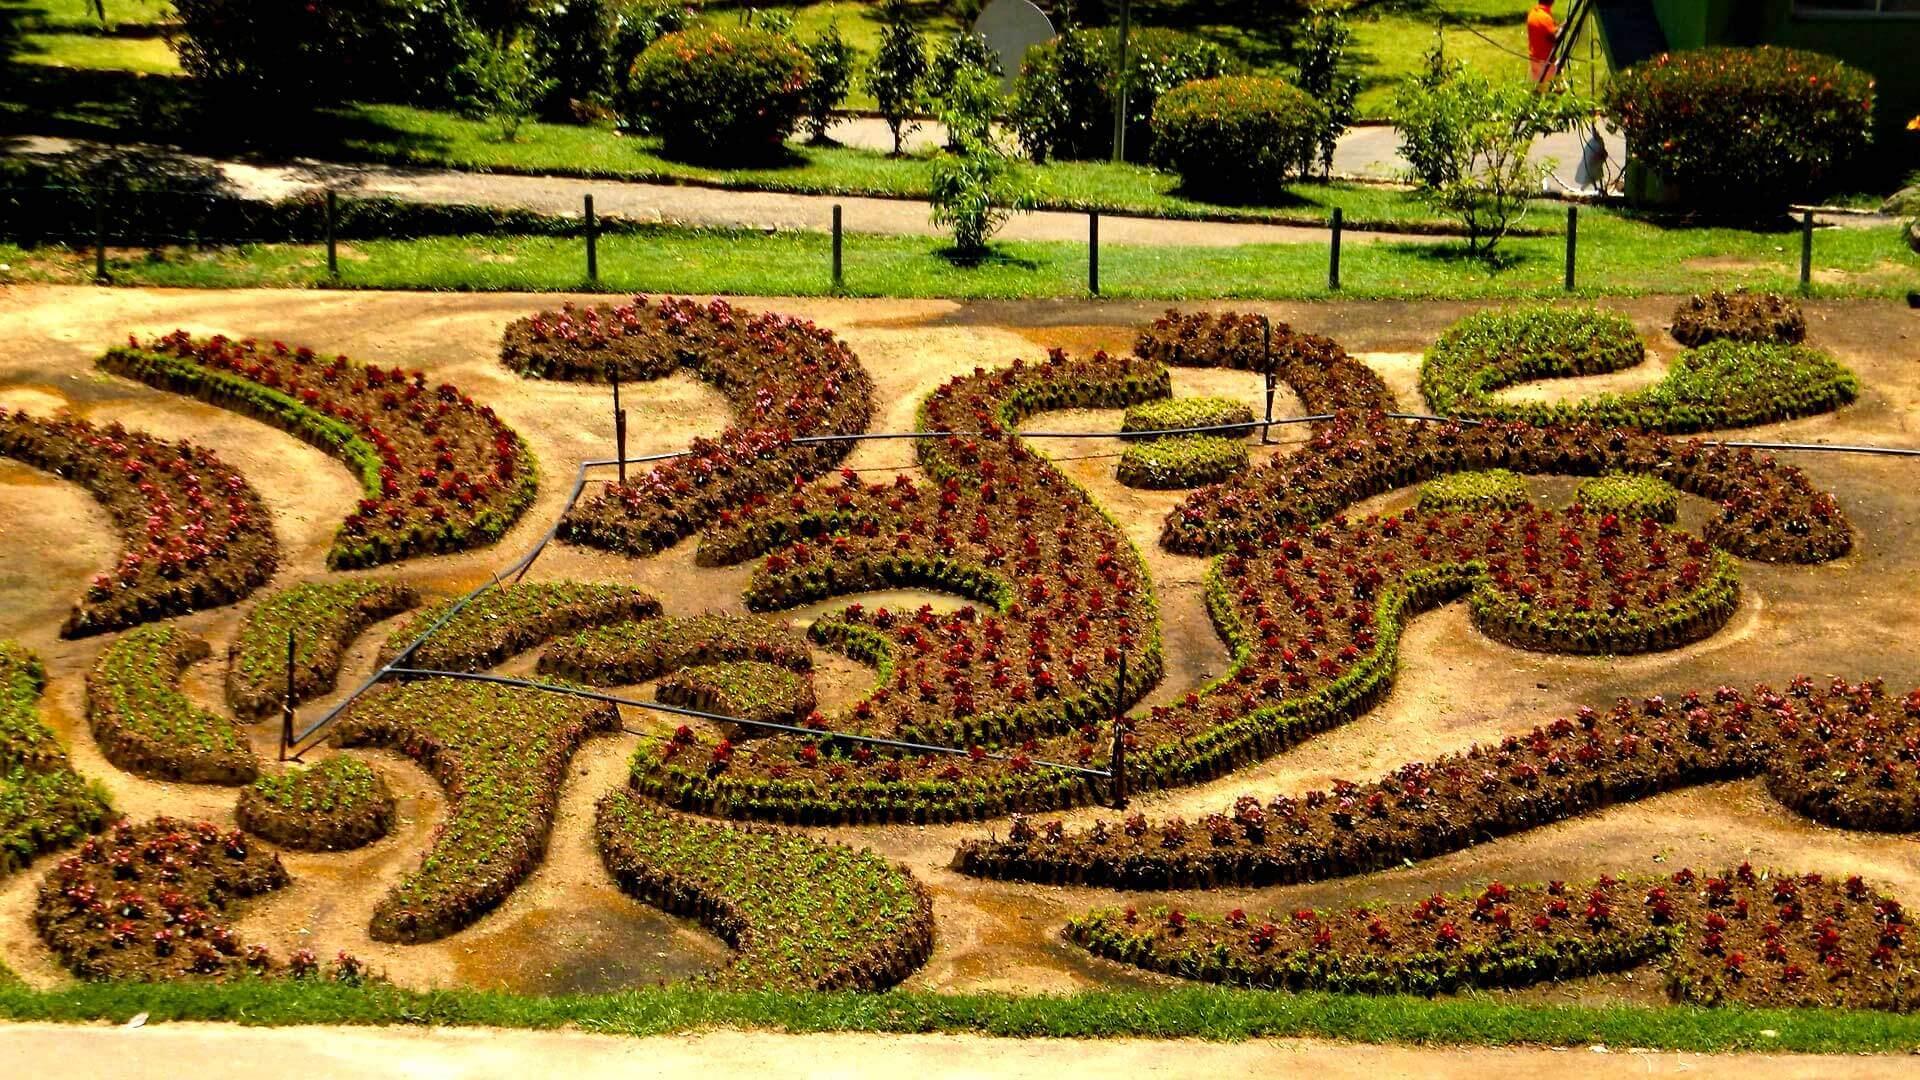 The Golden Ridge - Hakgala botanical gardens